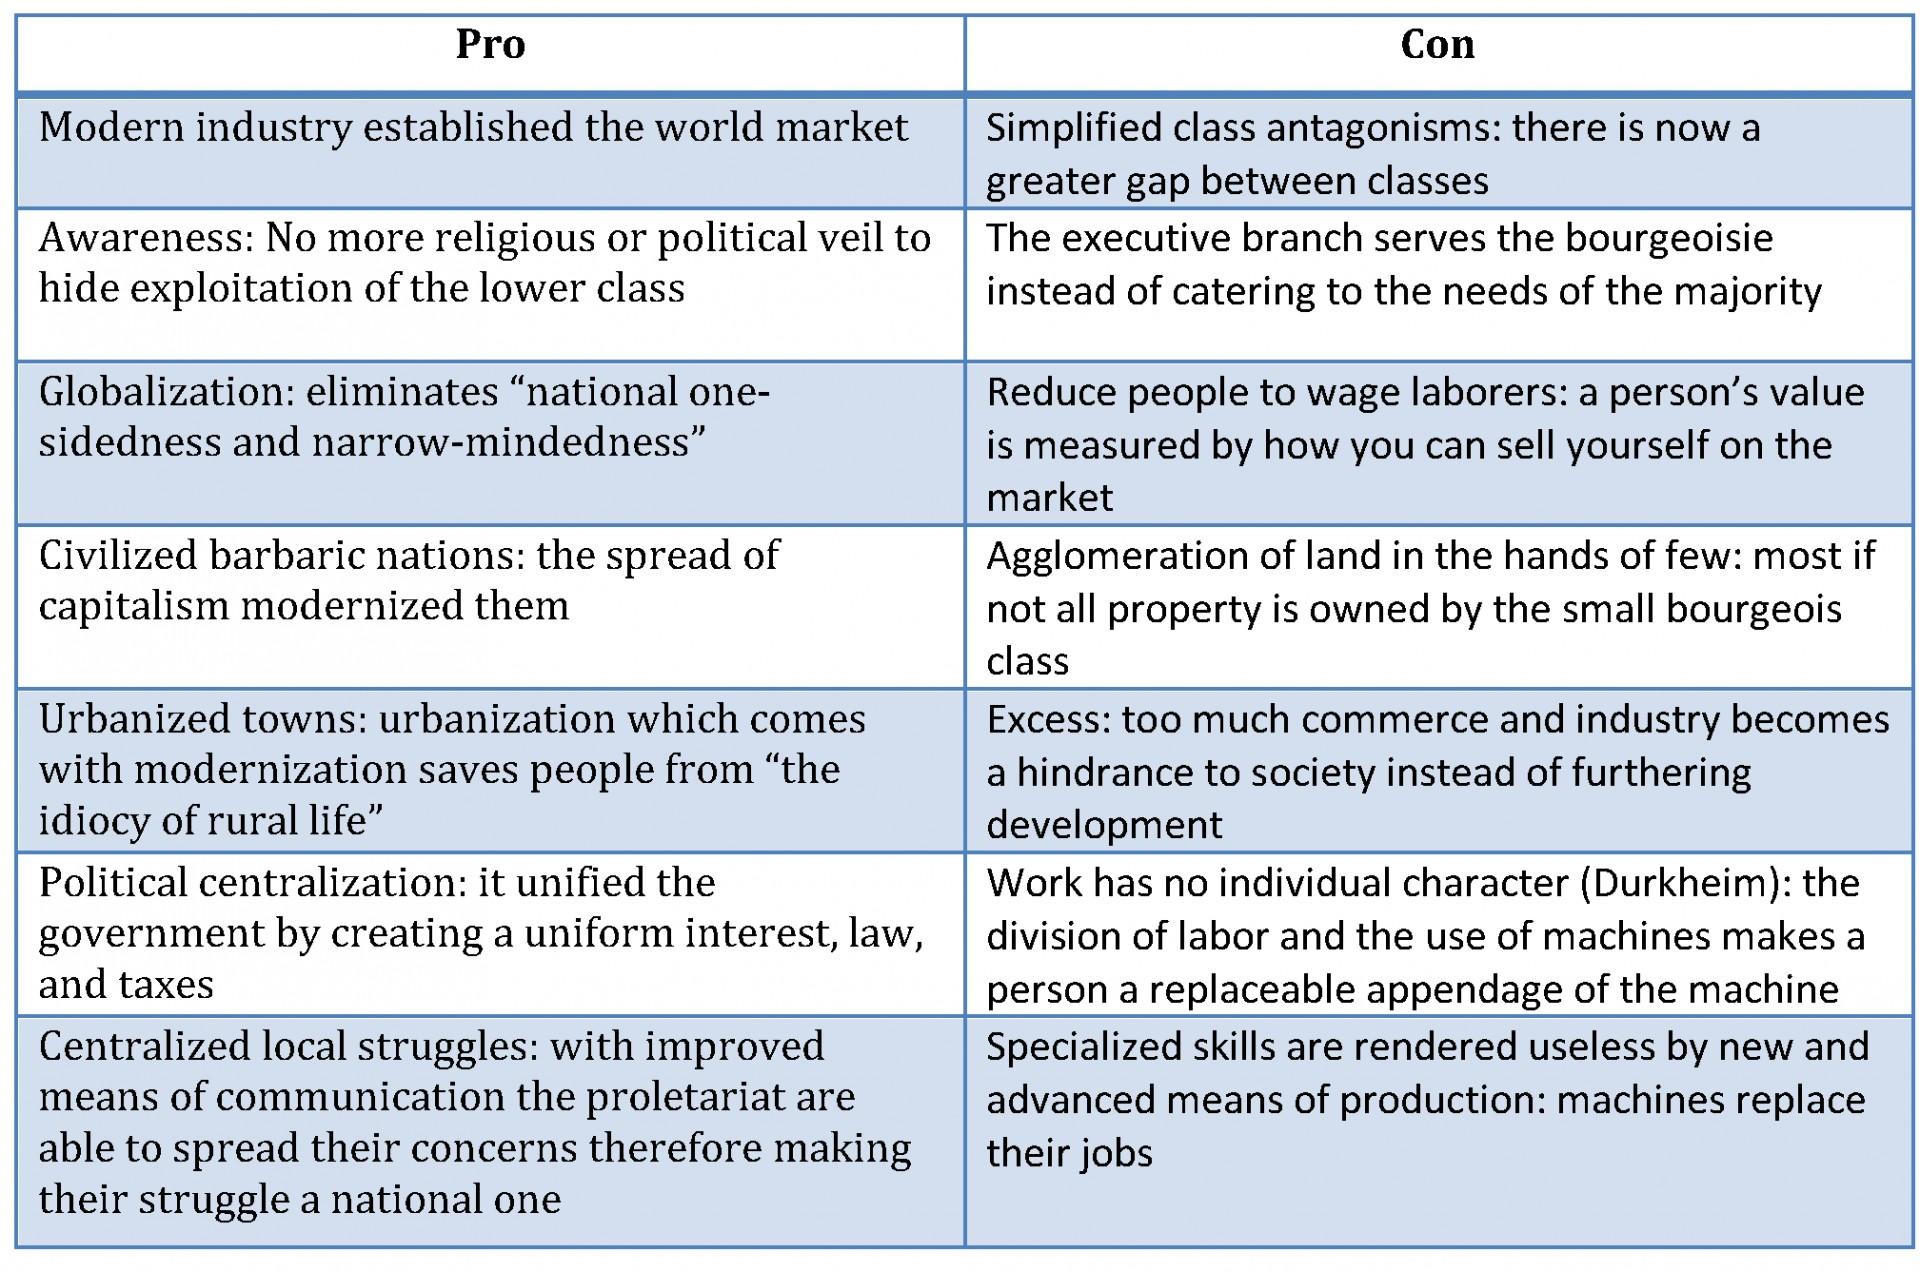 014 Essay Example Pro Death Penalty Fearsome Con Debate Argumentative Outline 1920